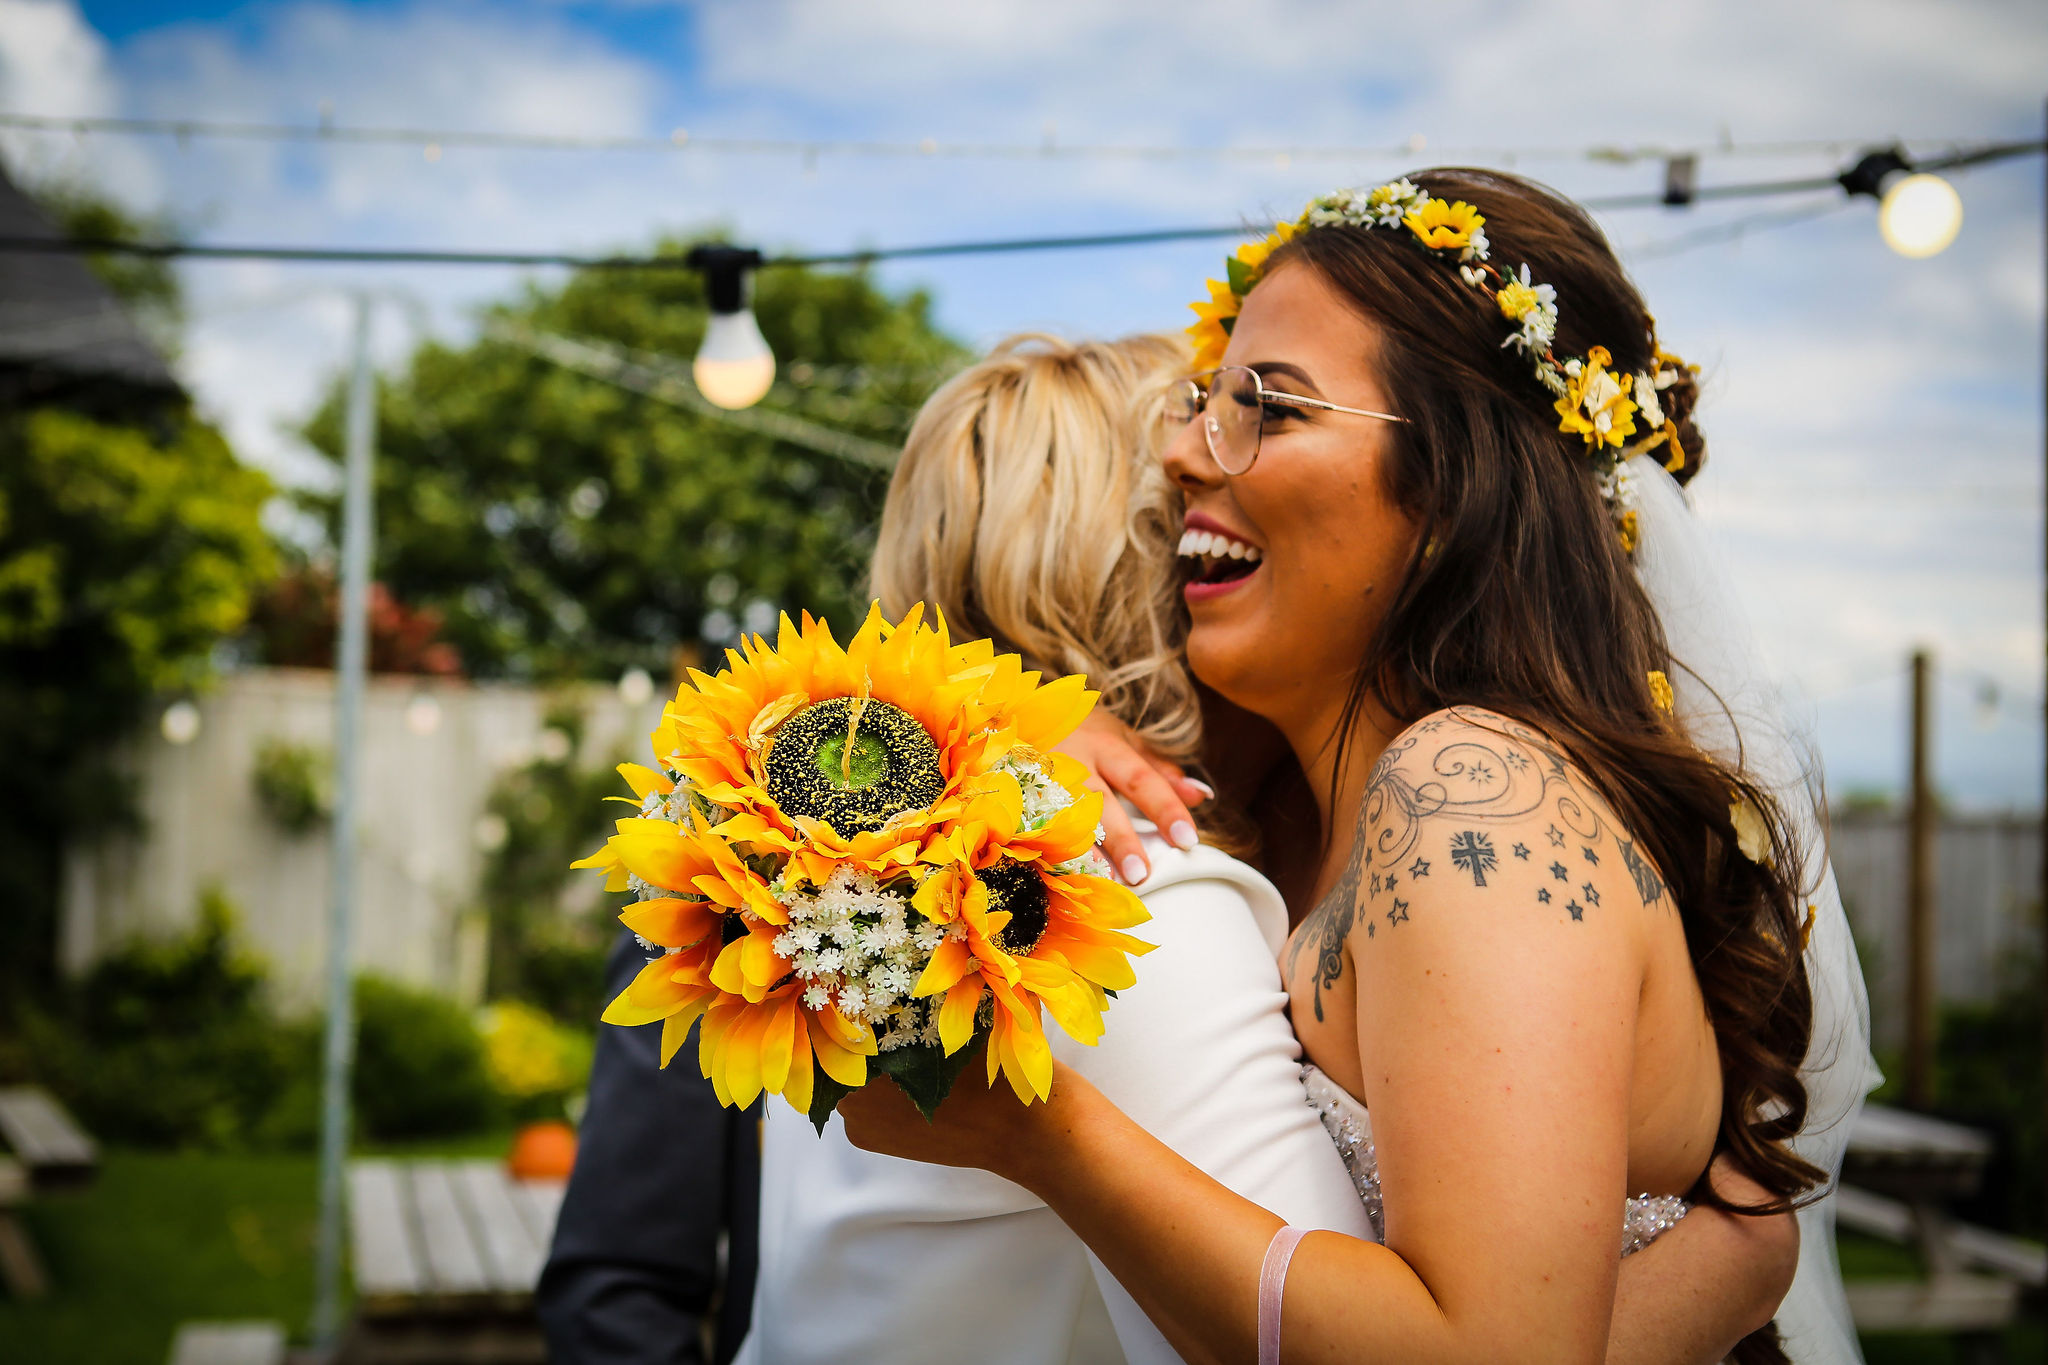 Harriet&Rhys Wedding - Magical sunflower wedding - quirky wedding with dodgems (74)